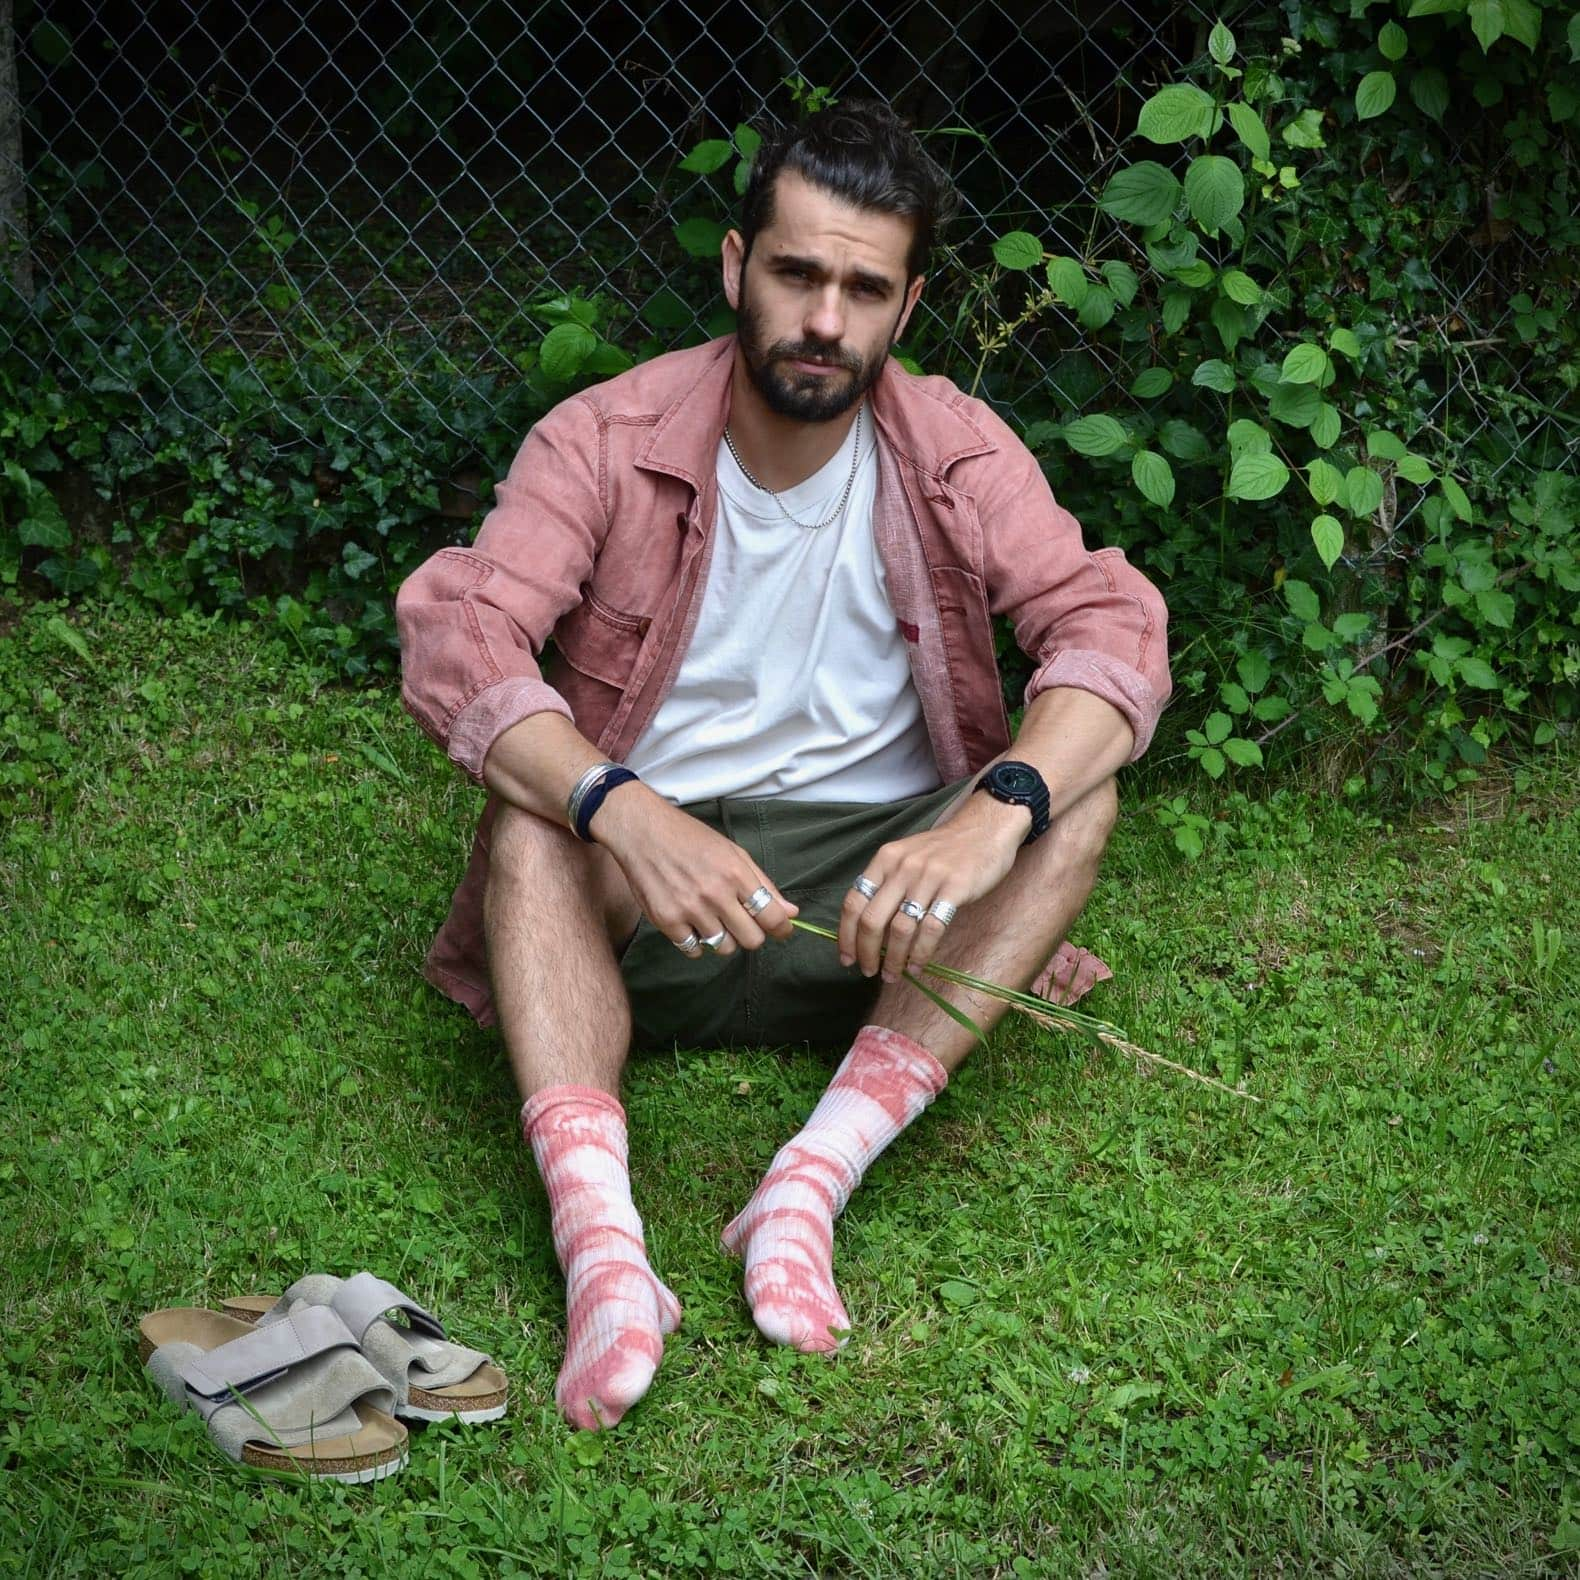 visvim-kilgore-jacket-salmon-drapeau-noir-seersucker-shorts-royalties-chaussette-rose